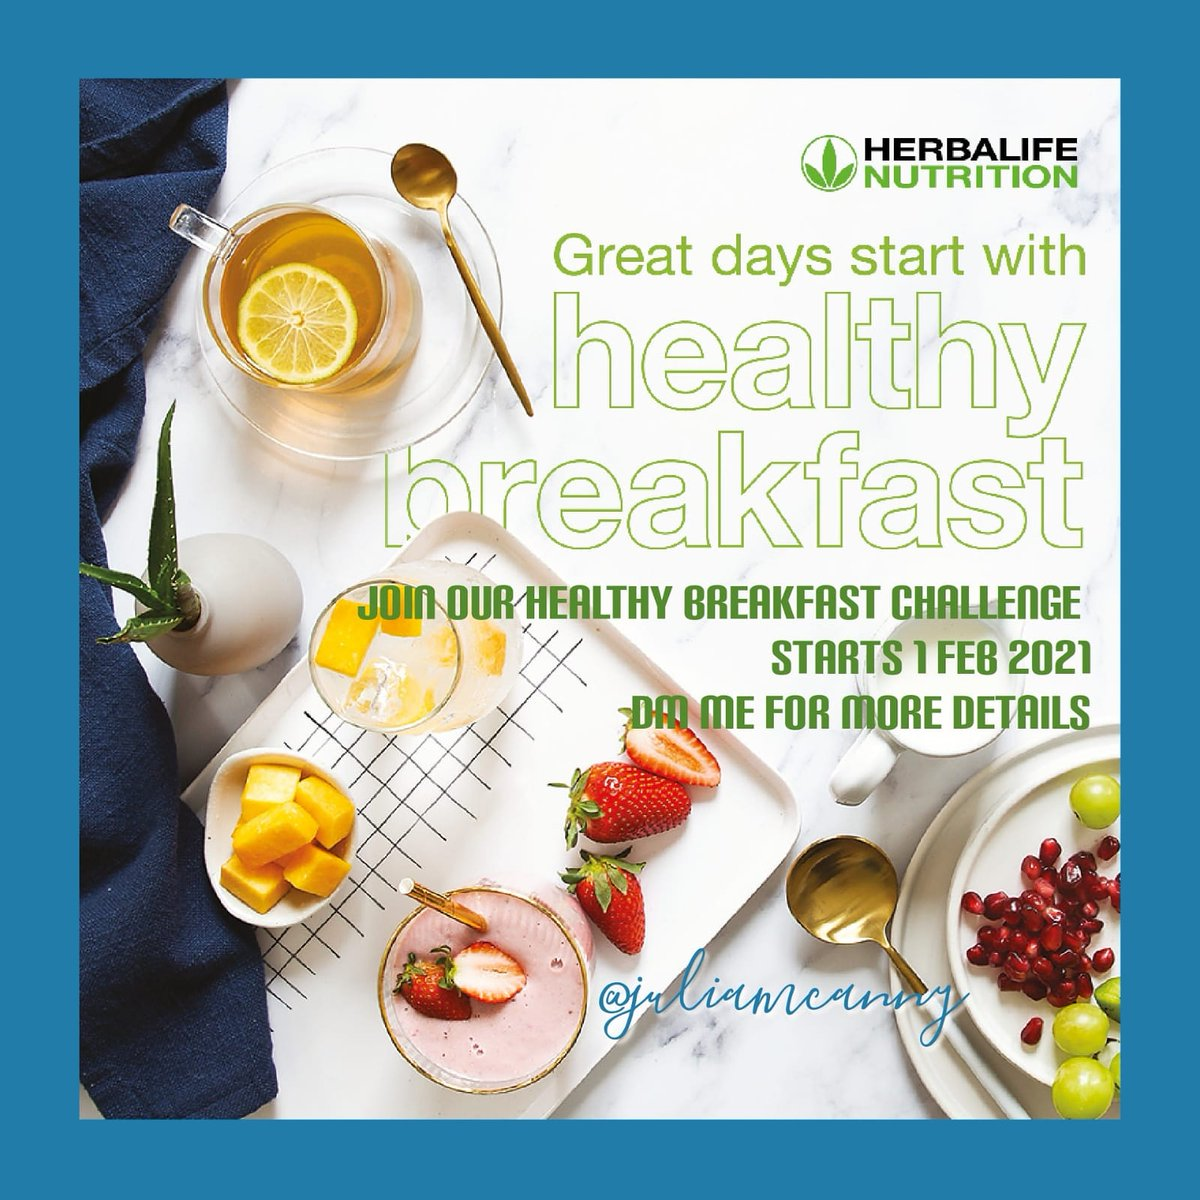 Healthy Breakfast Challenge  #love.#instagood #photooftheday #fashion #beautiful #like4like #picoftheday #art #challenge # #bellyfat #breakfast #health